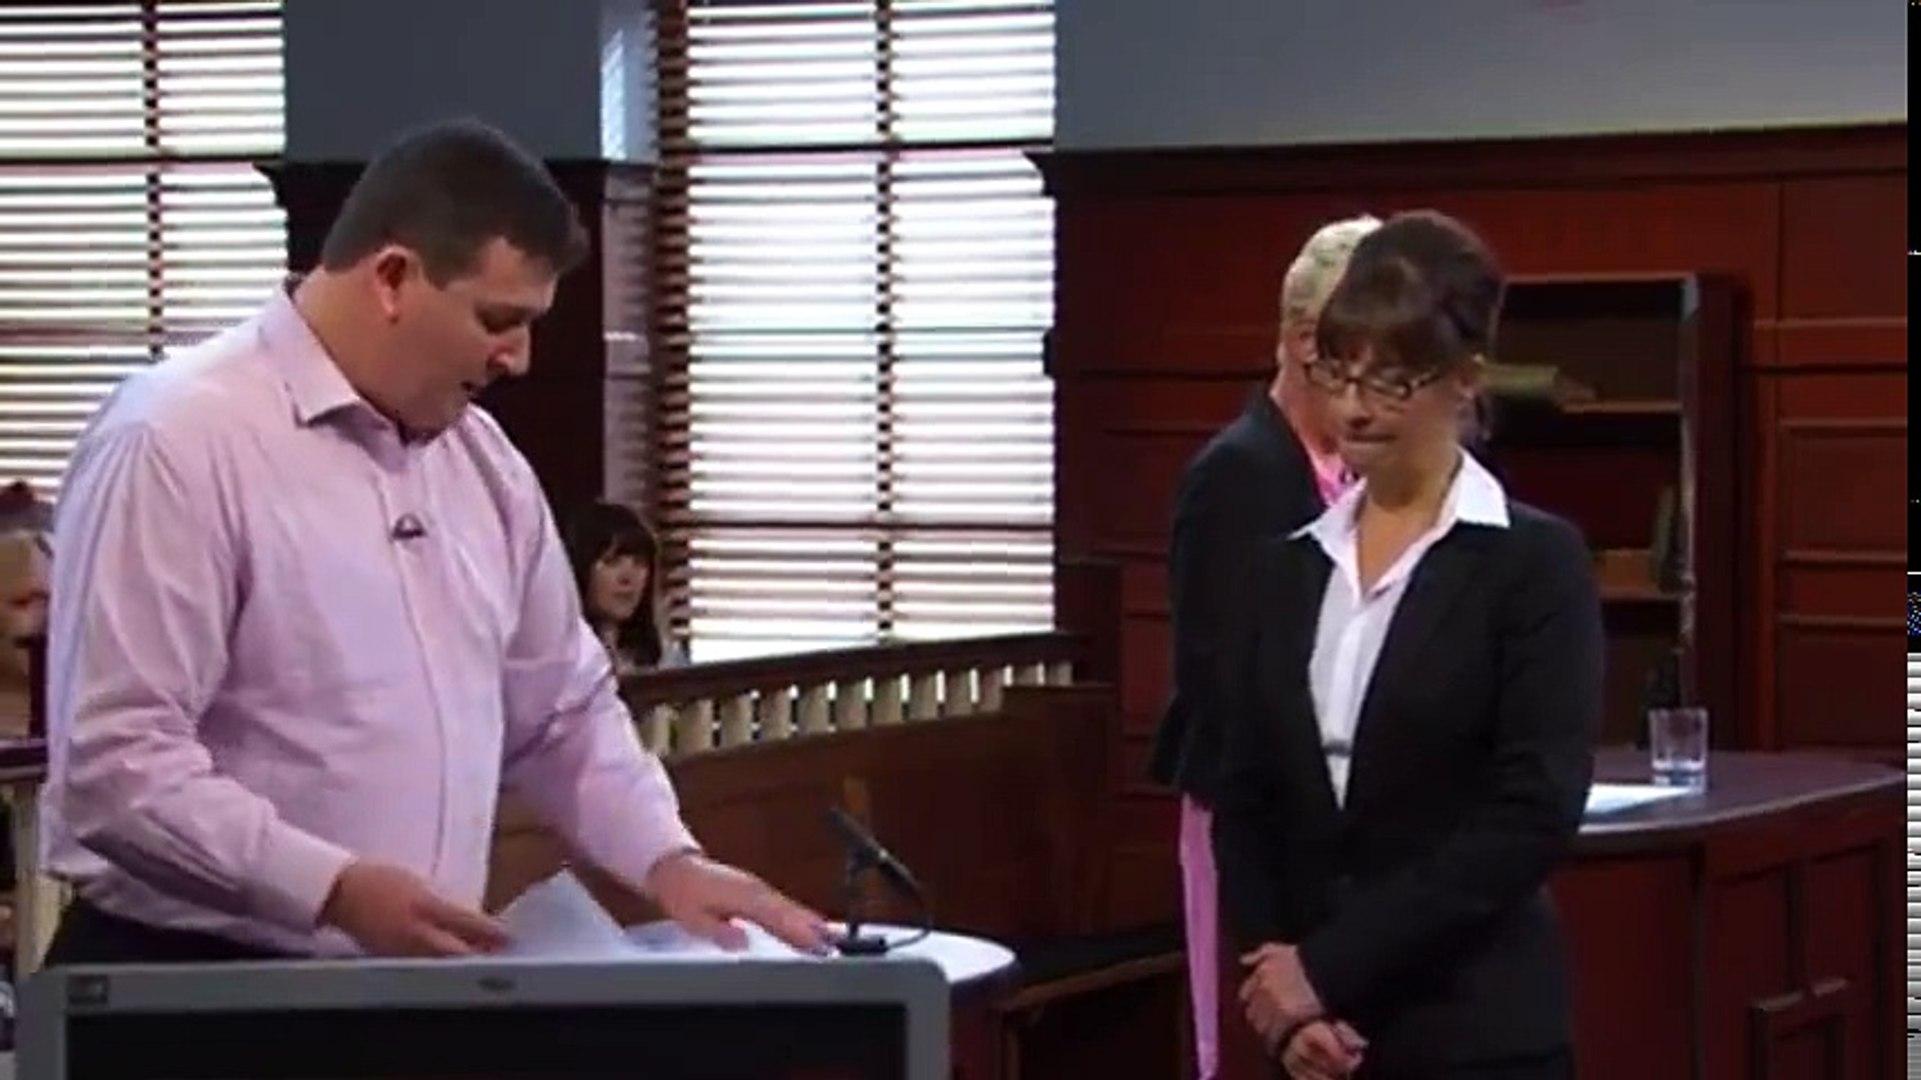 Judge Rinder S01 - Ep02 Ian V Martin, Liam V Josh, Jenny V... HD Watch